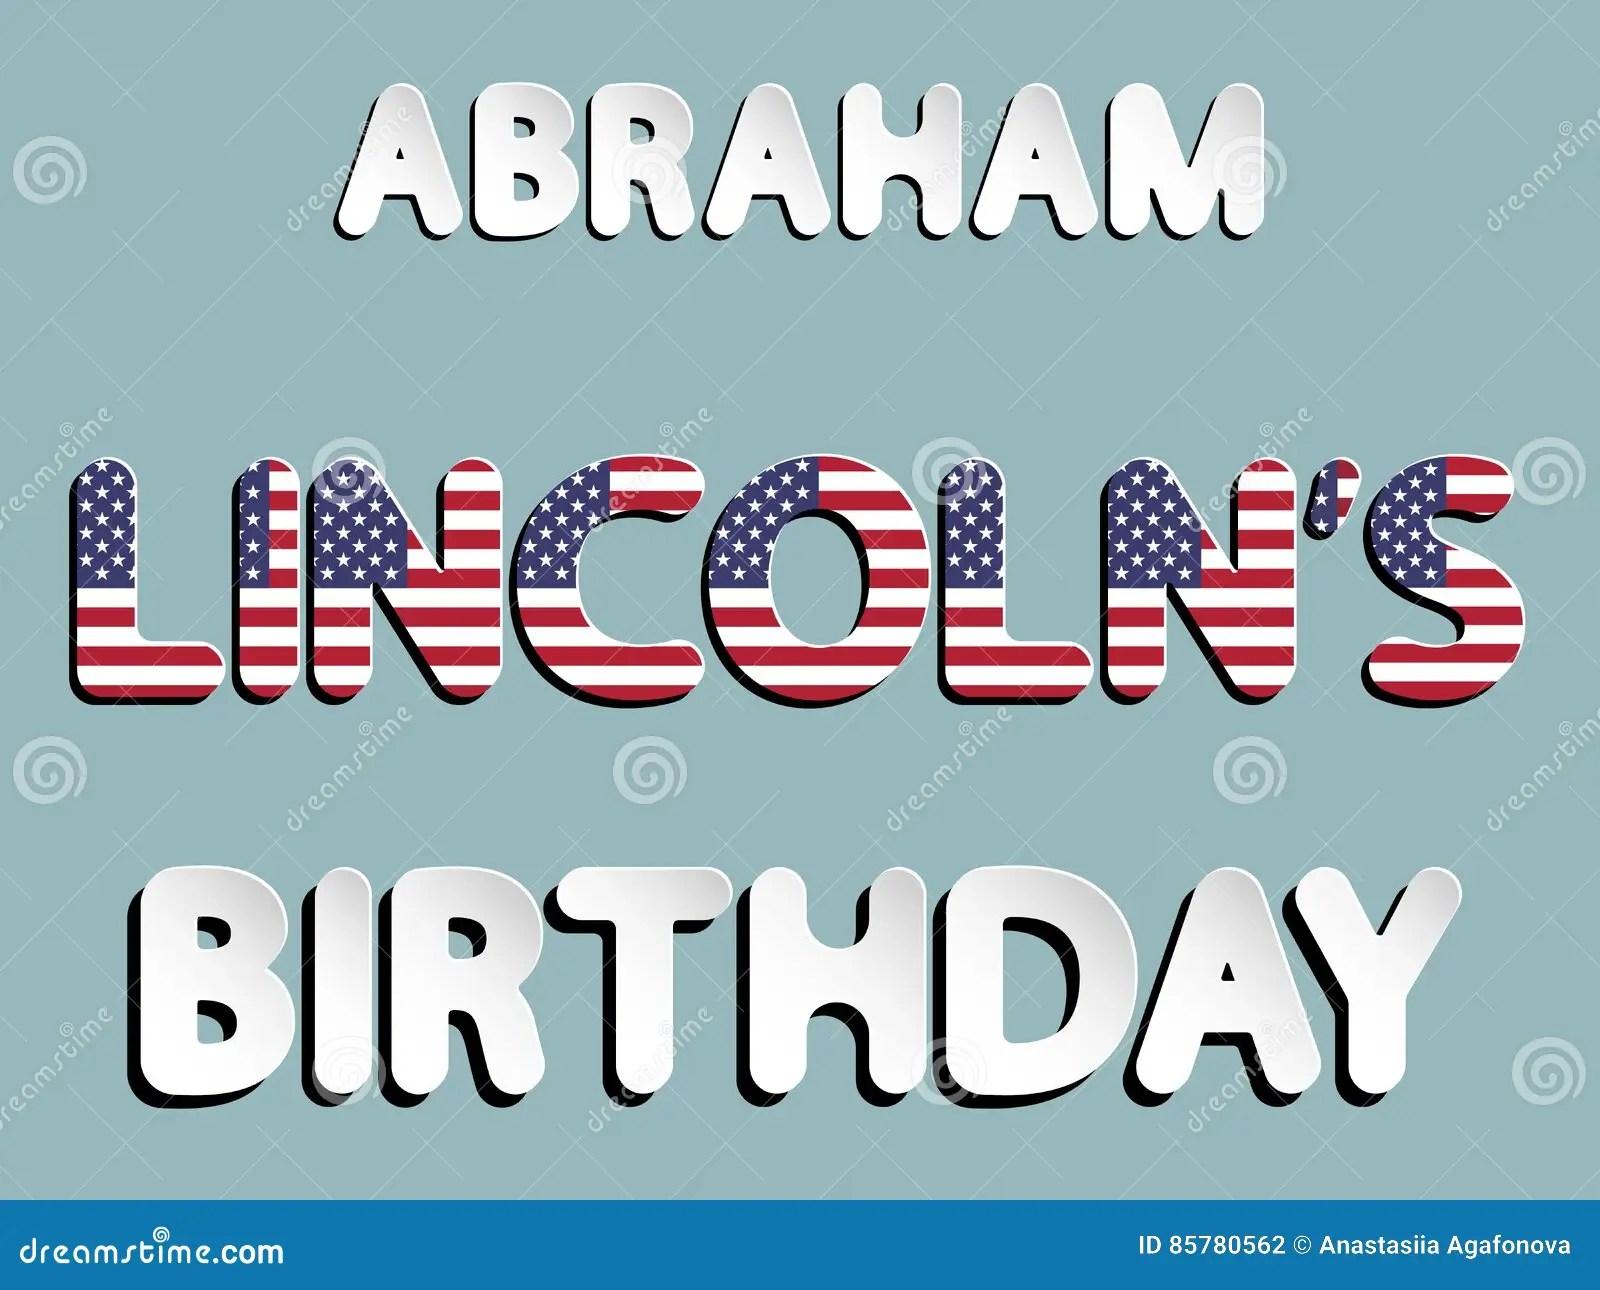 Abraham Lincoln Birthday Stock Vector Illustration Of